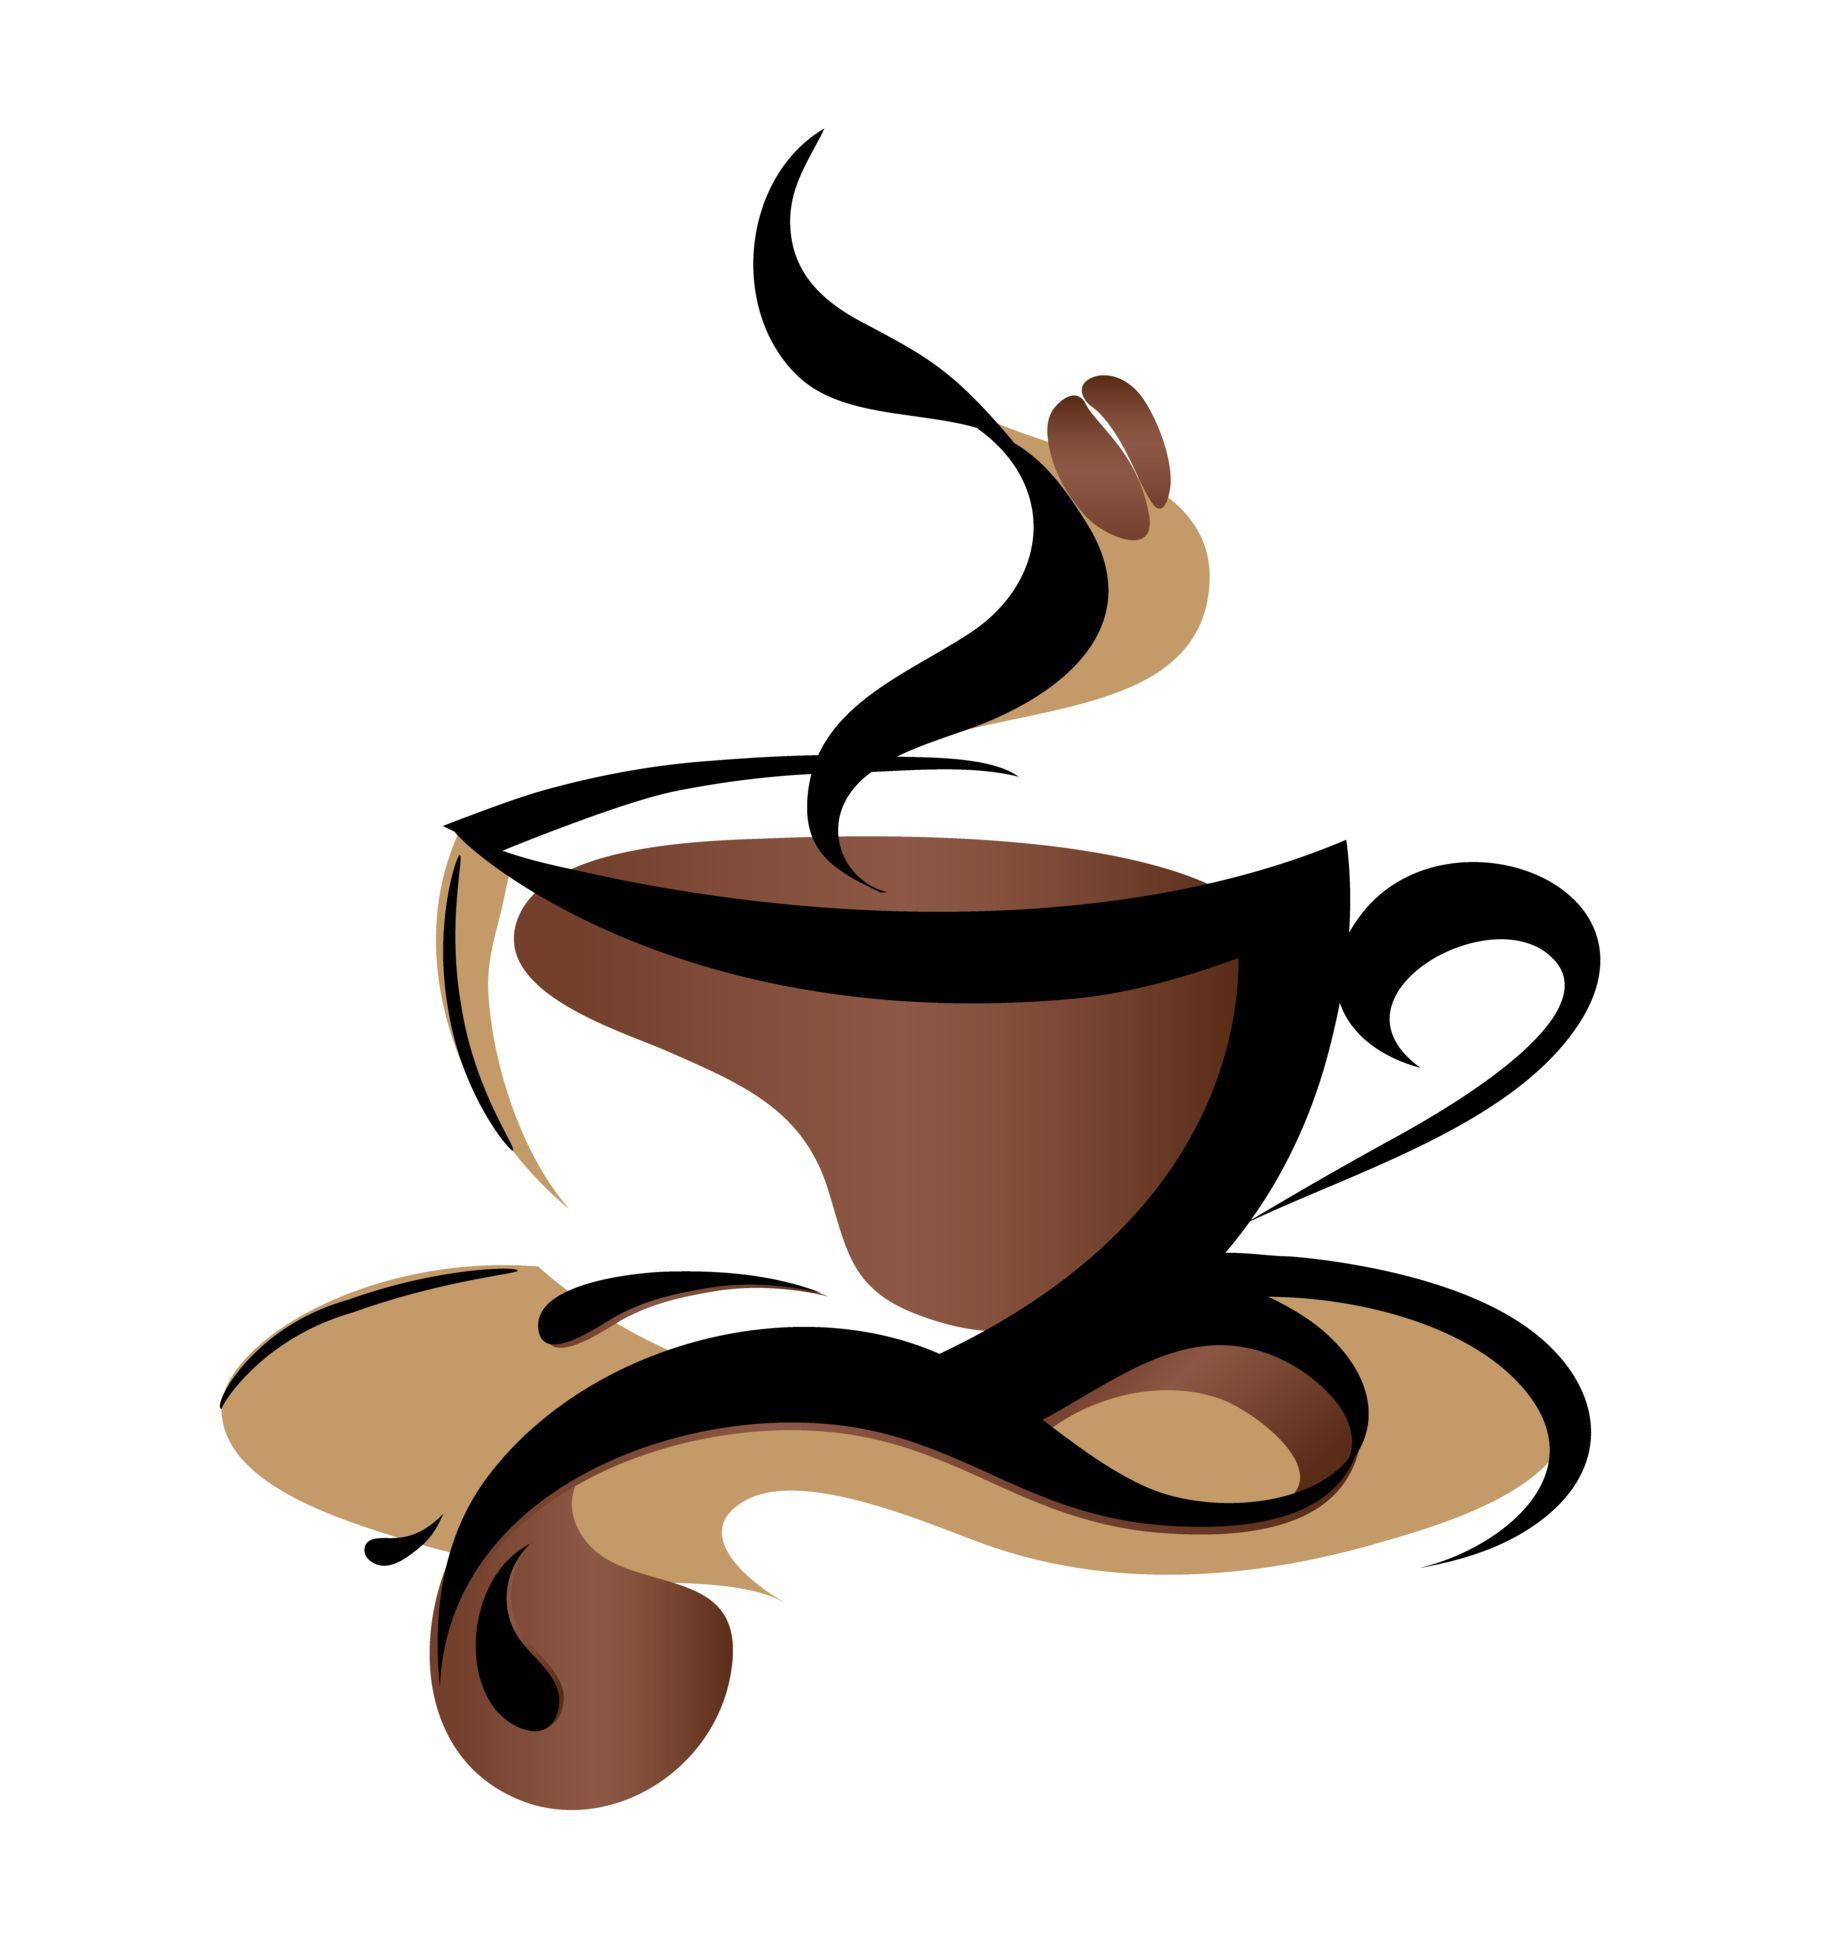 coffee tumblr google keres s u2022 u2022 u2022 coffee rh pinterest com Coffee Shop Clip Art Coffee Shop Clip Art